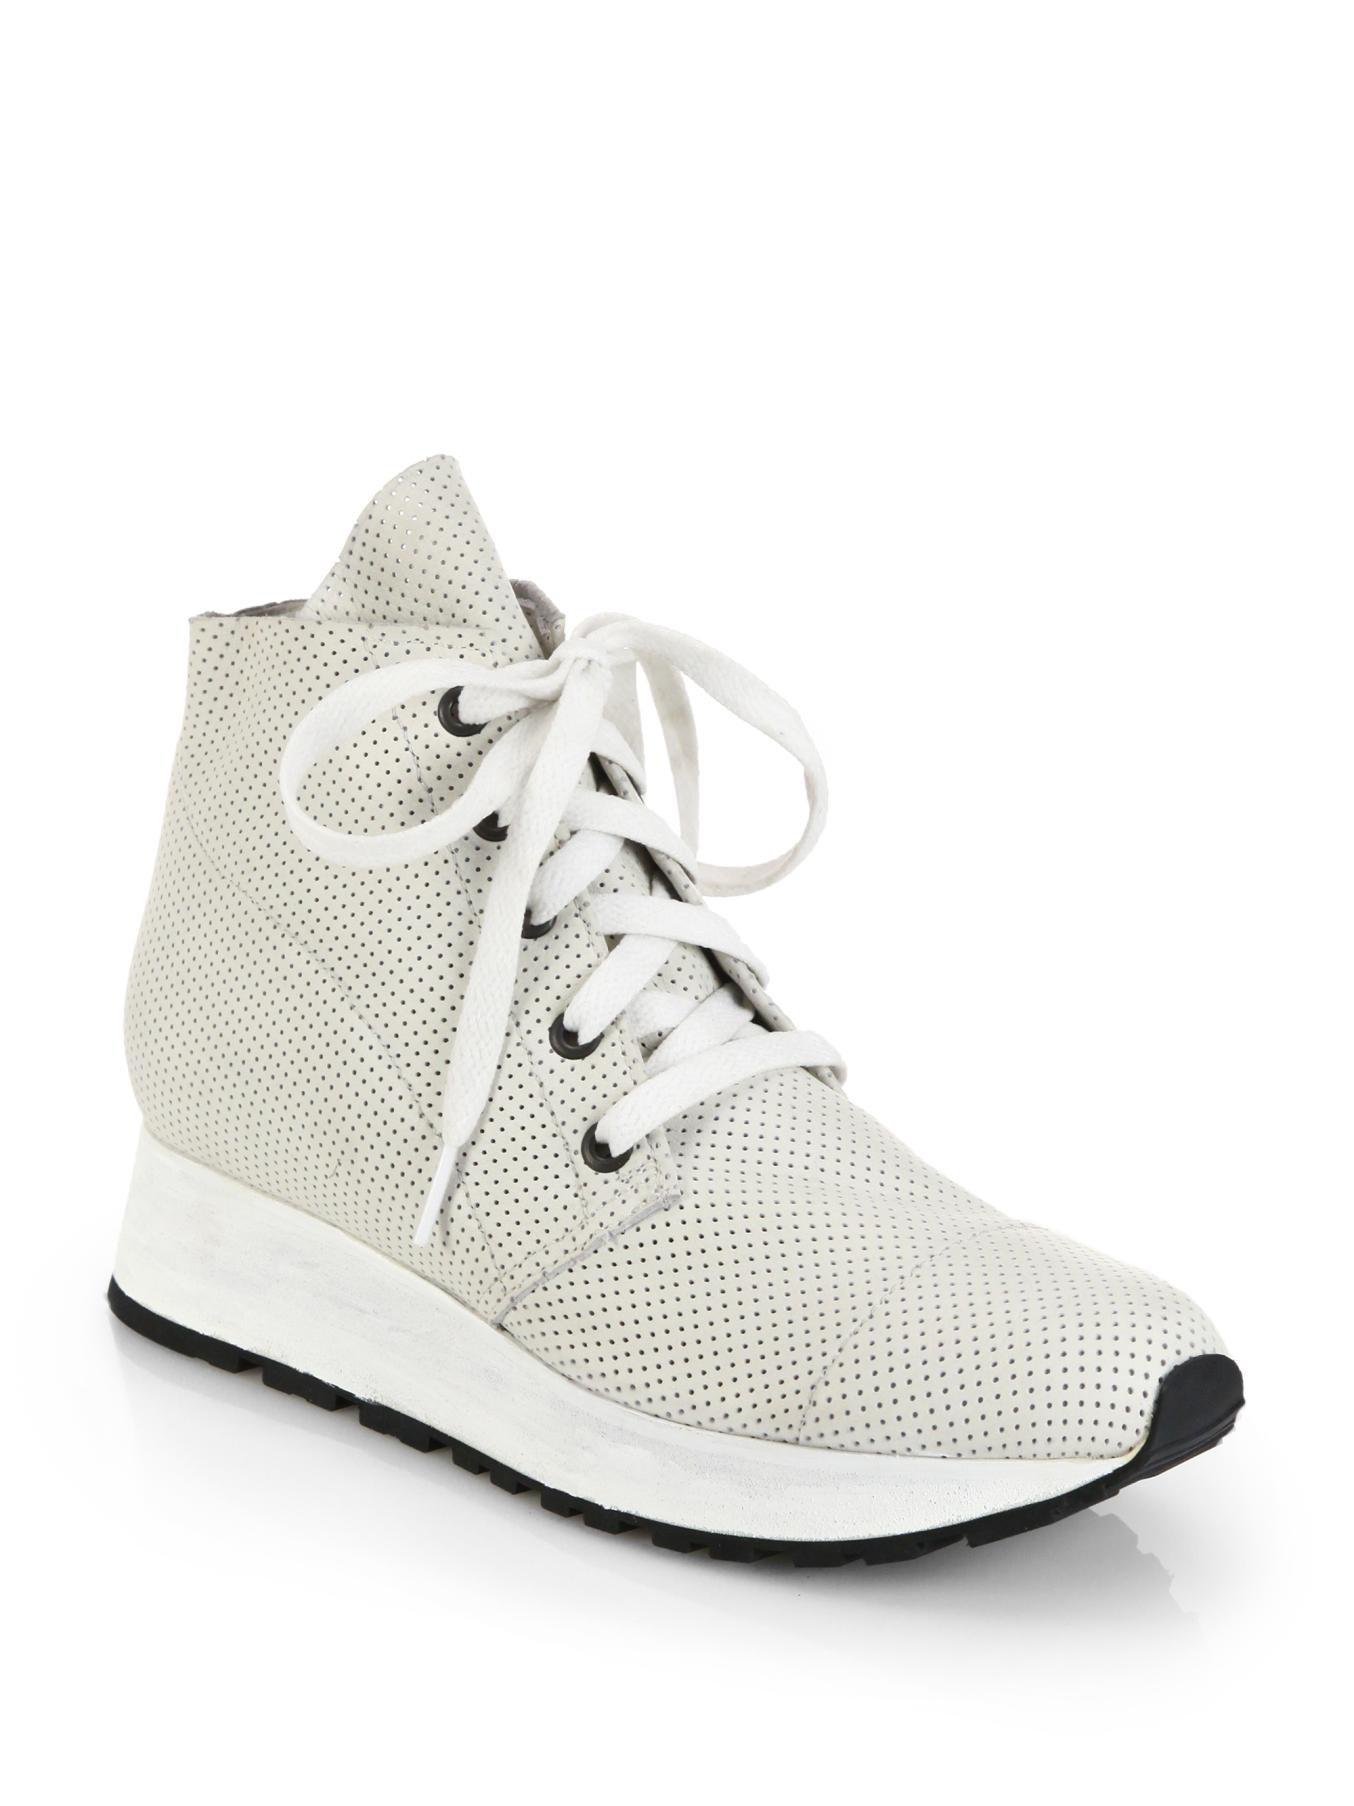 Ld Tuttle The Bleach Running Shoes